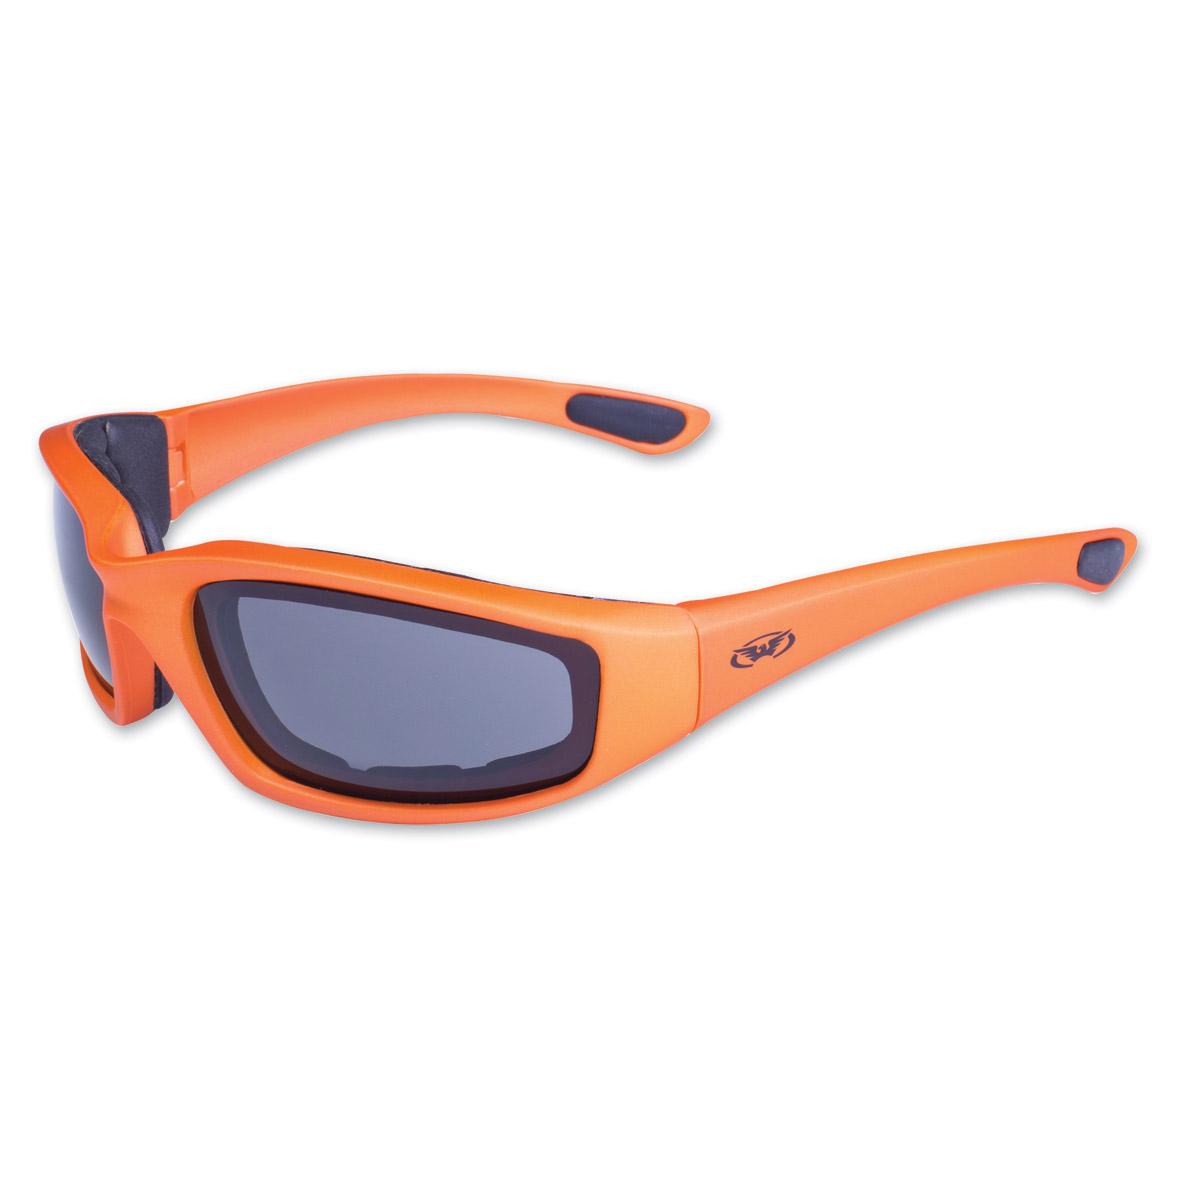 global vision eyewear kickback orange sunglasses wtih